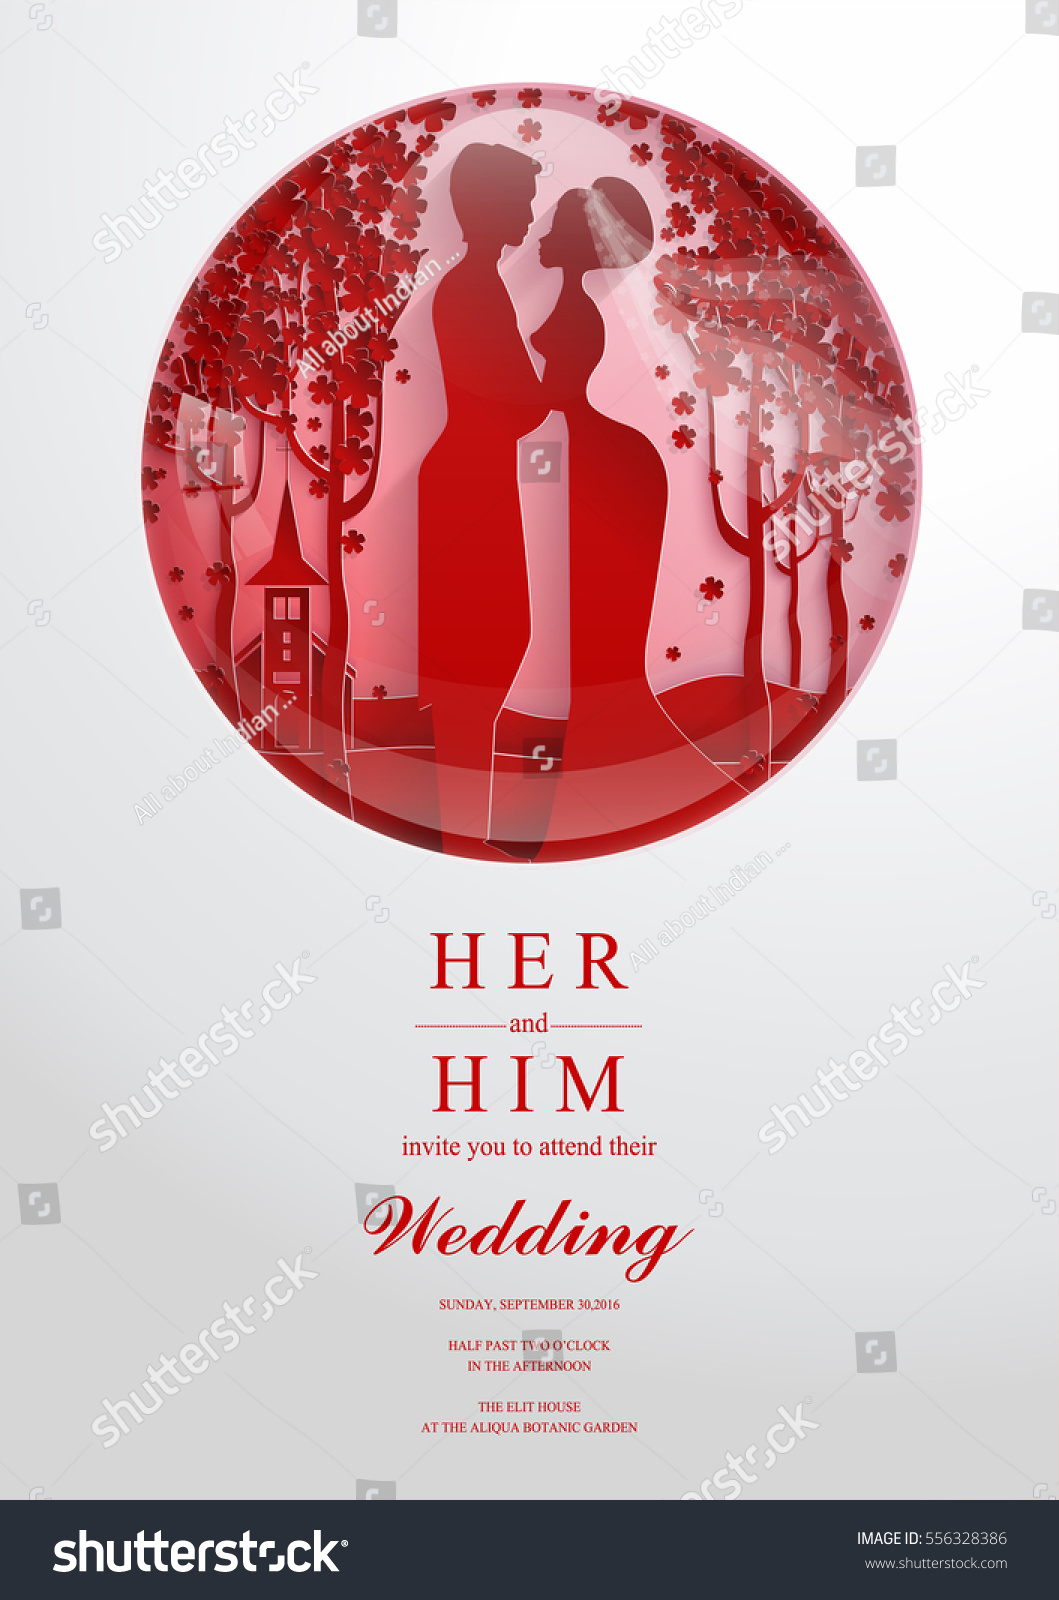 Wedding Invitation Card Templates Paper Art Stock Vector 556328386 ...